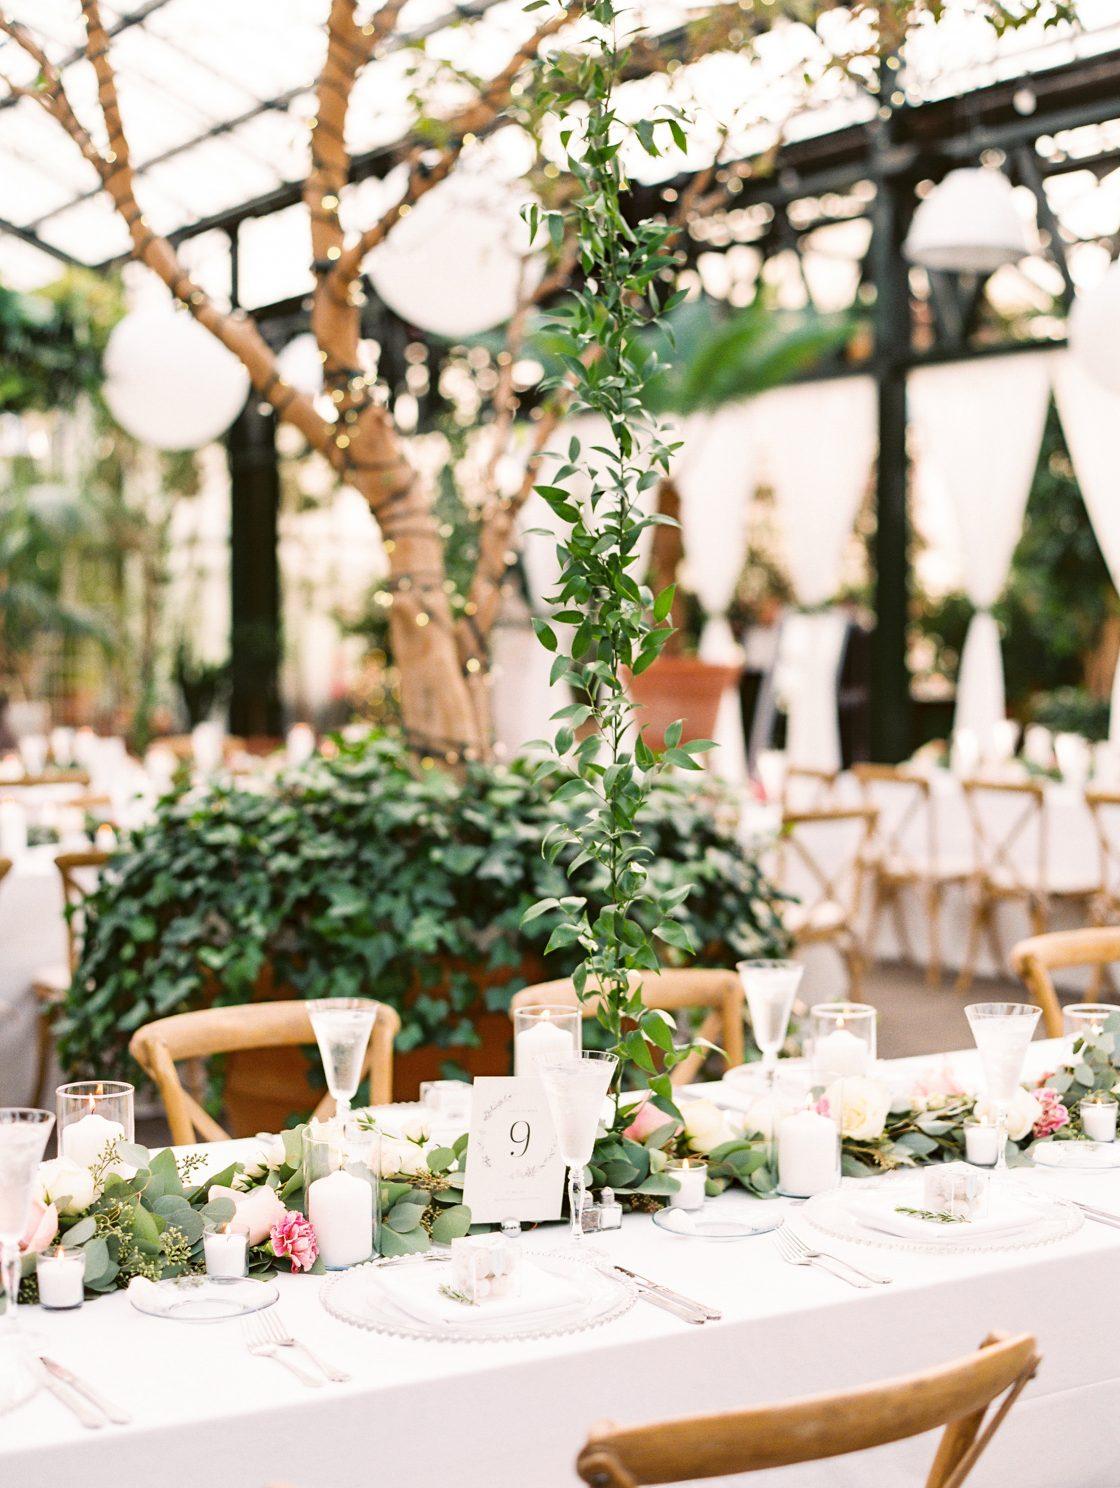 Botanical Conservatory Greenery Wedding Reception Decor